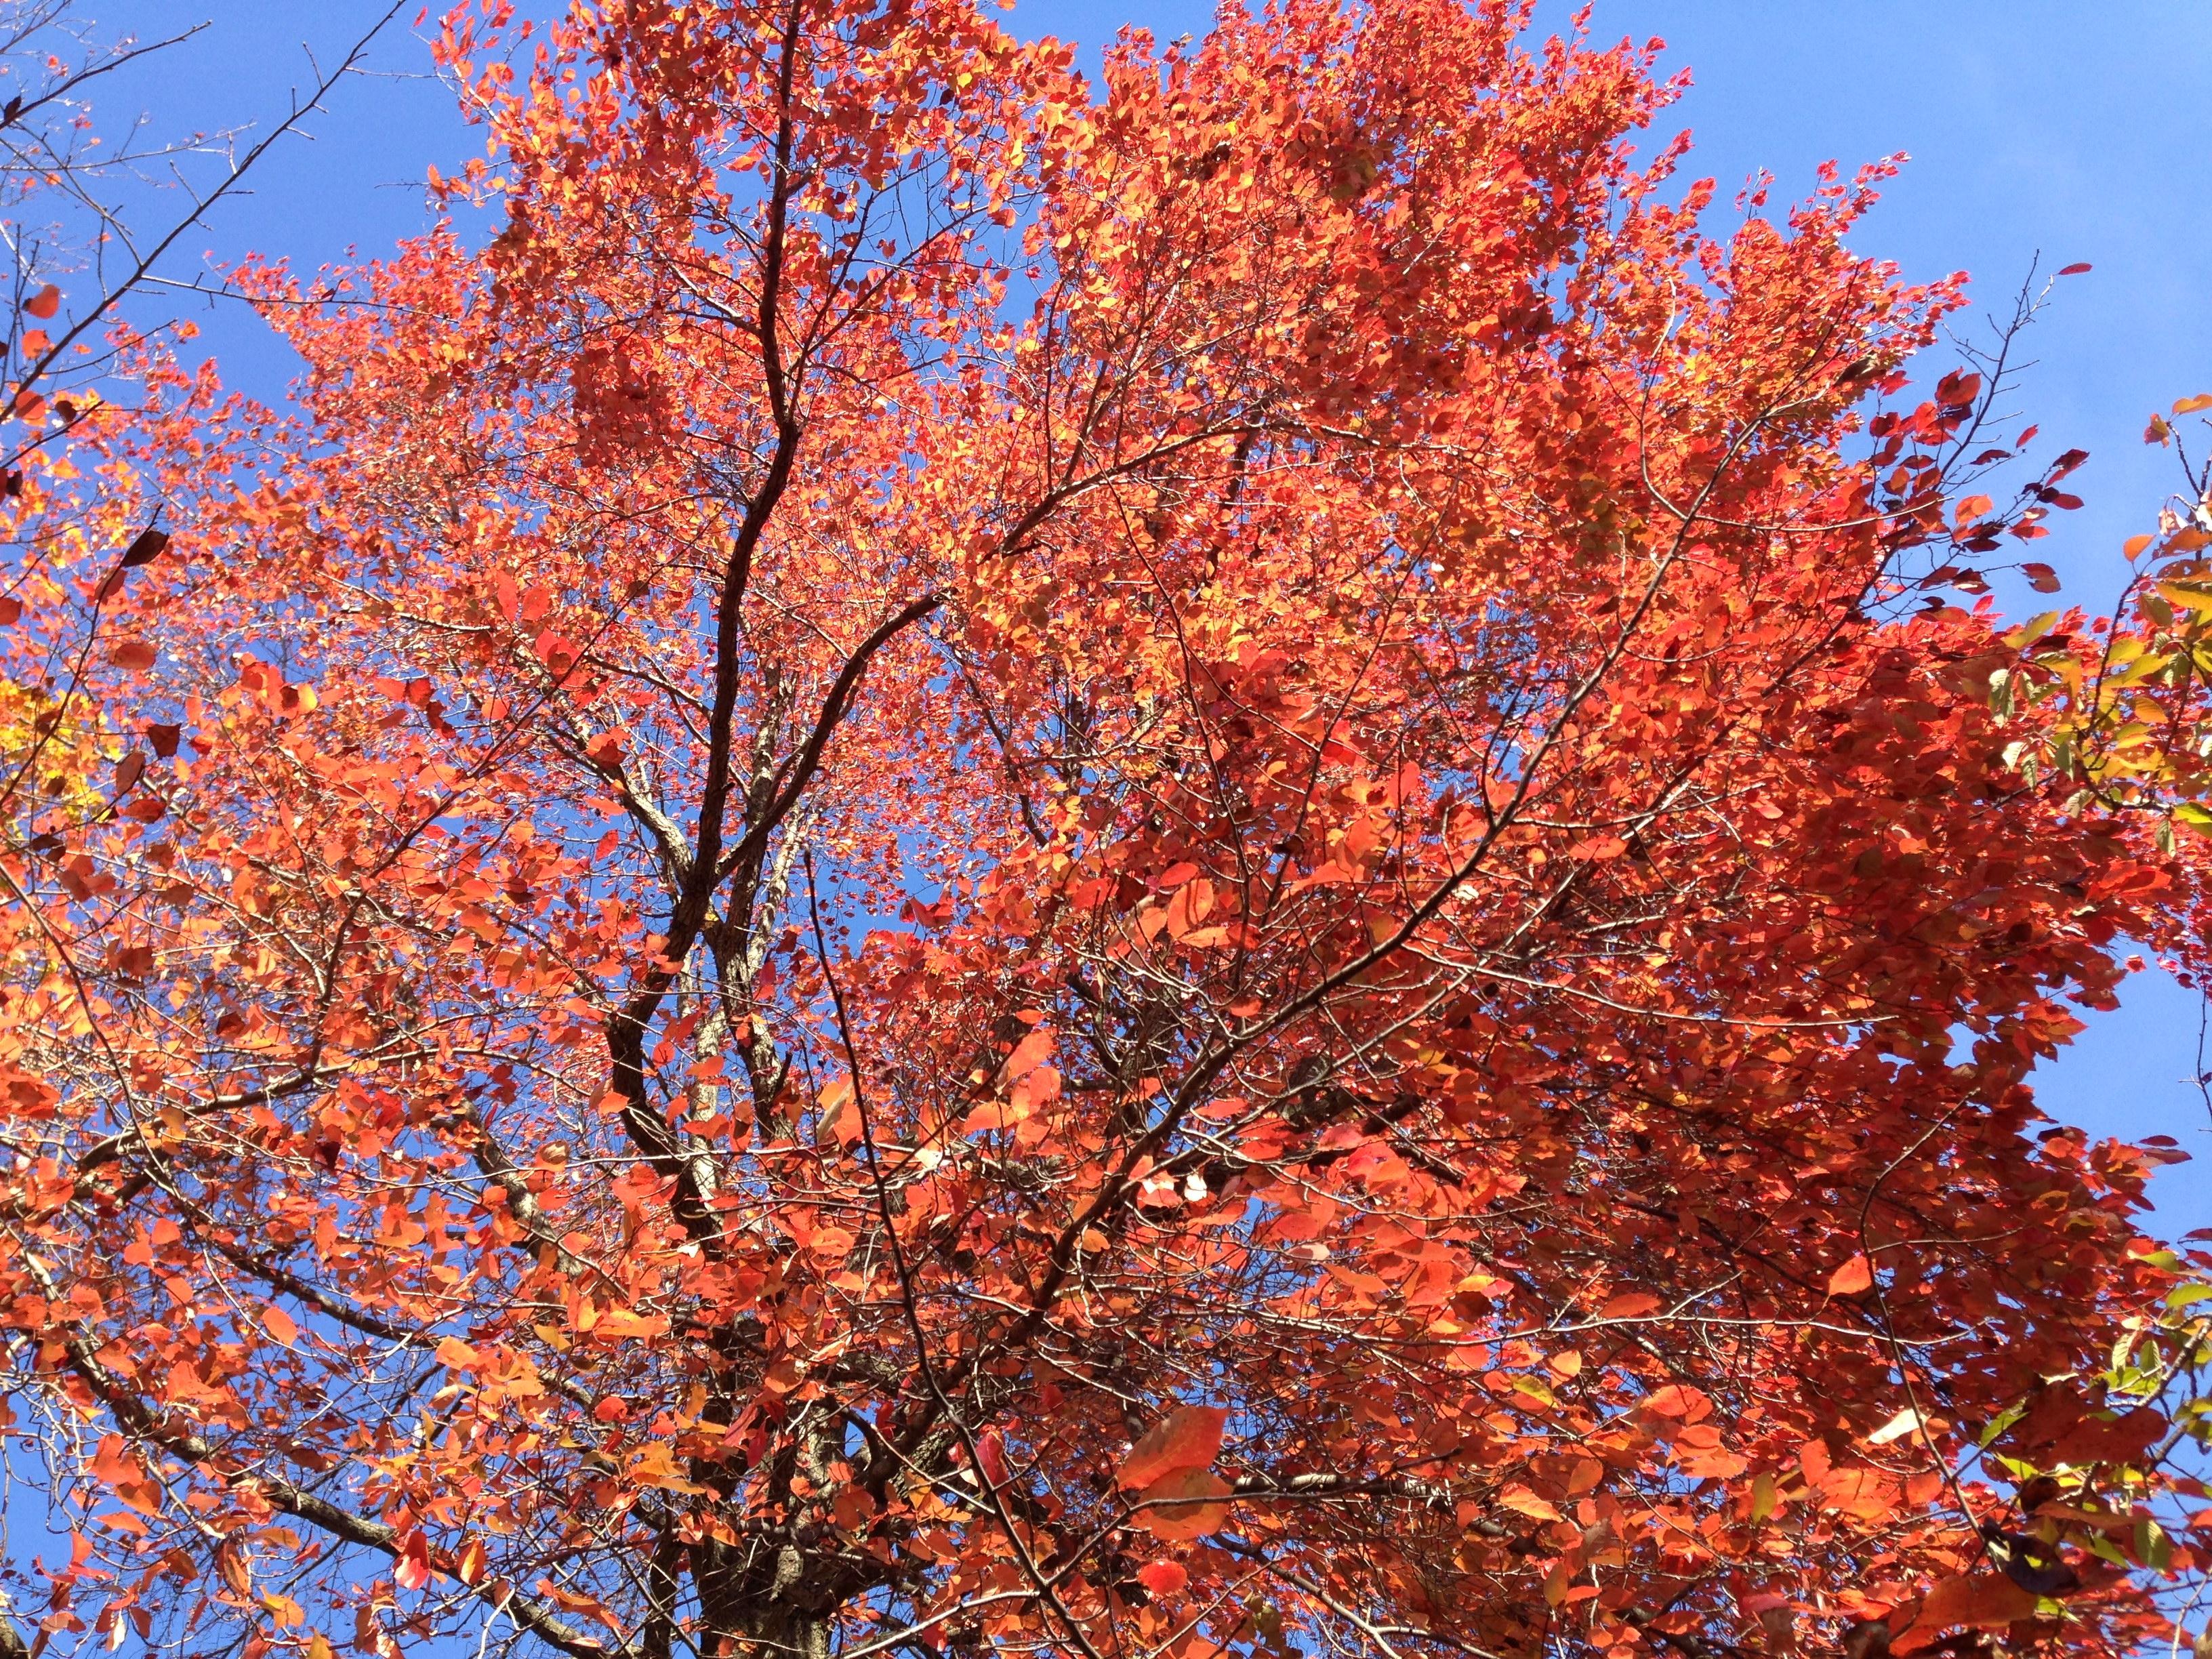 file2014 11 02 12 47 37 black tupelo foliage during autumn at the